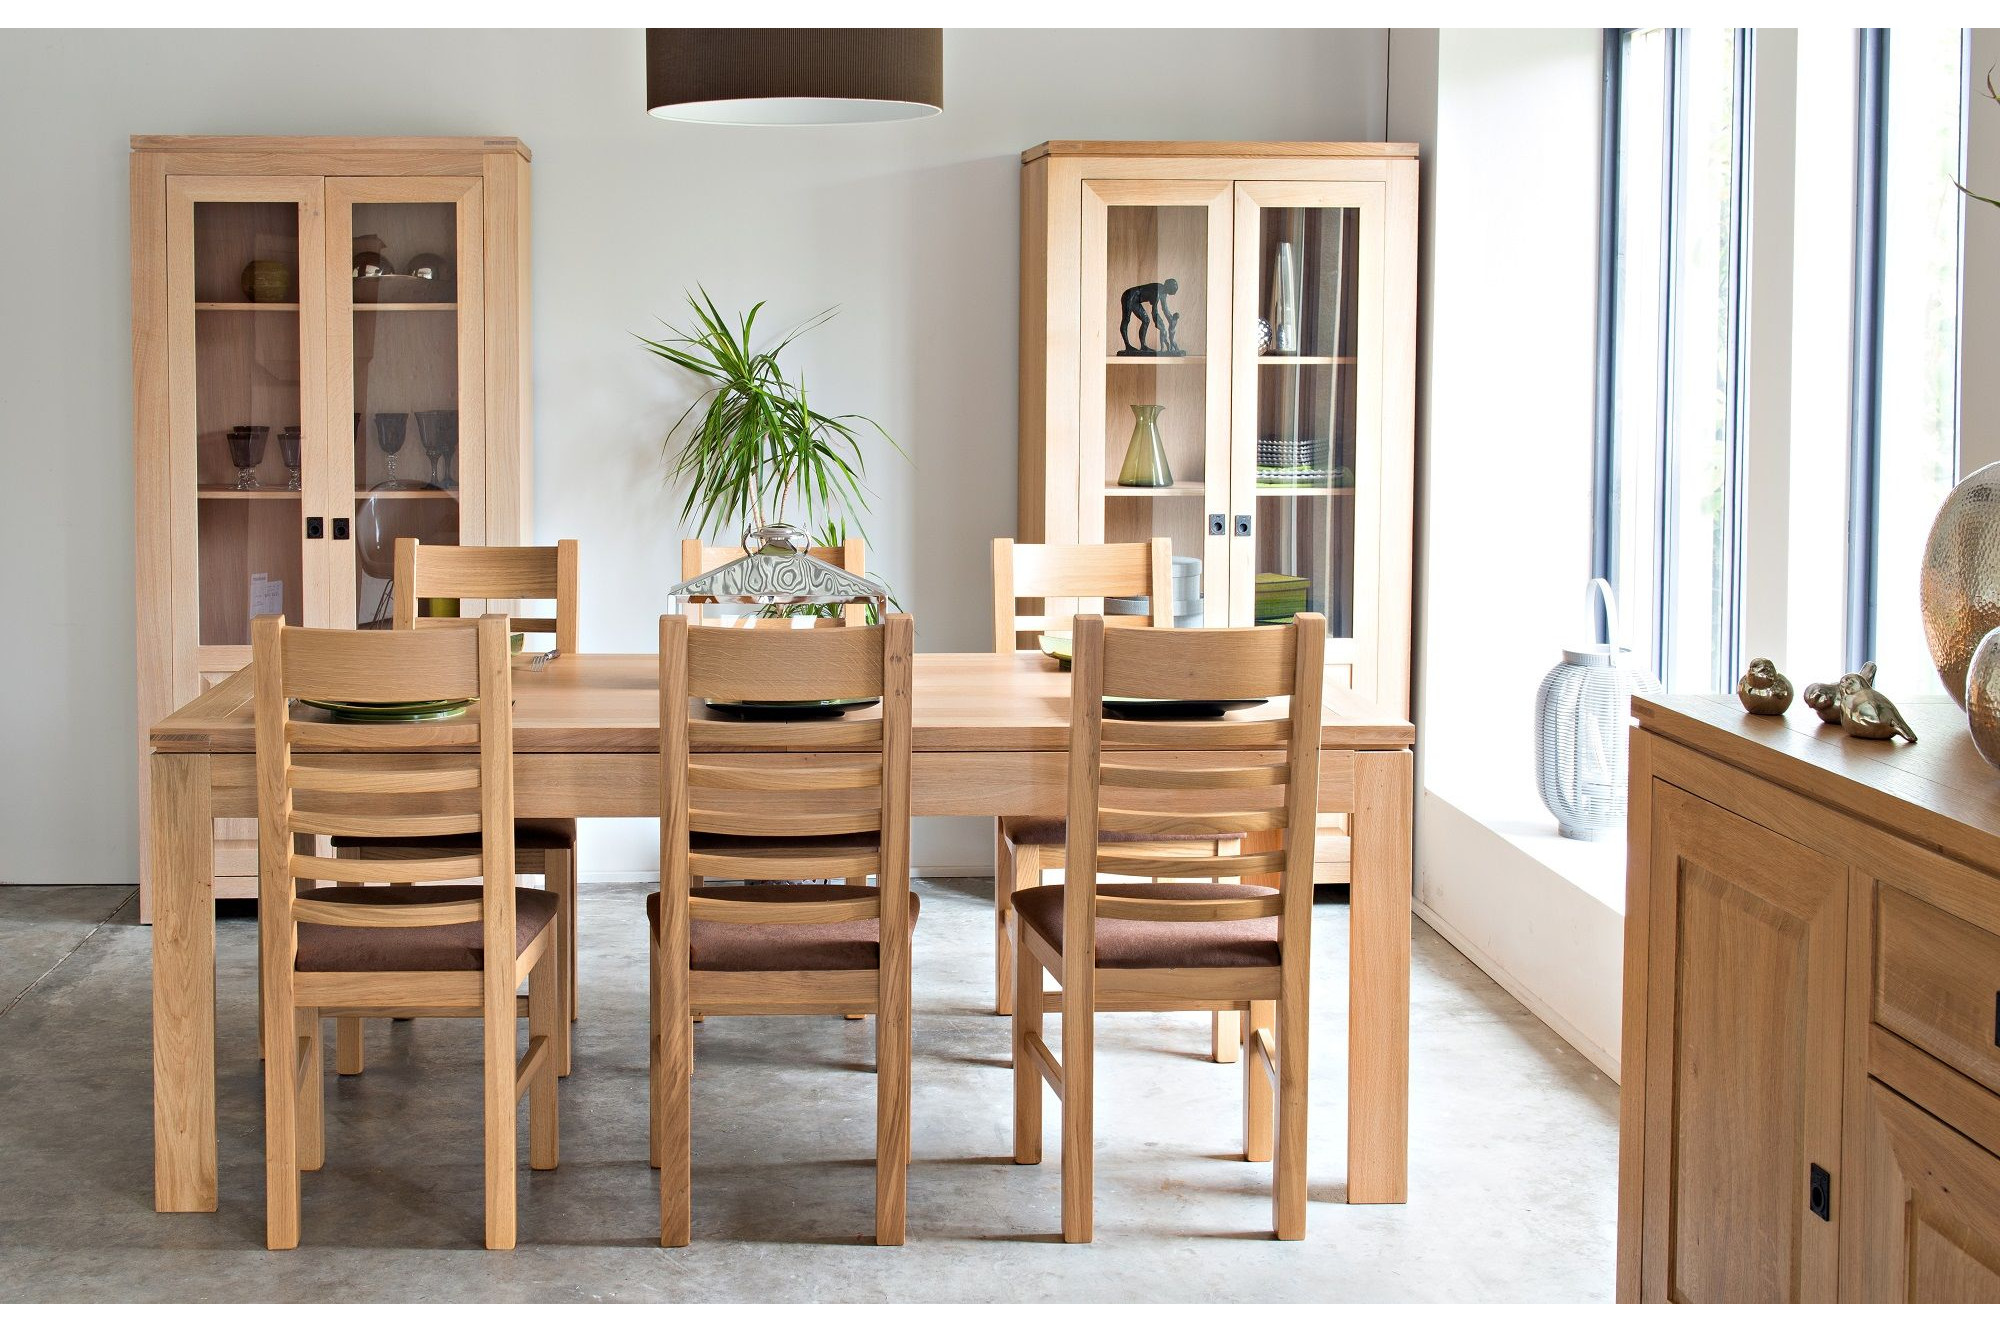 table moderne avec allonges centrales en ch ne clair boston hellin. Black Bedroom Furniture Sets. Home Design Ideas